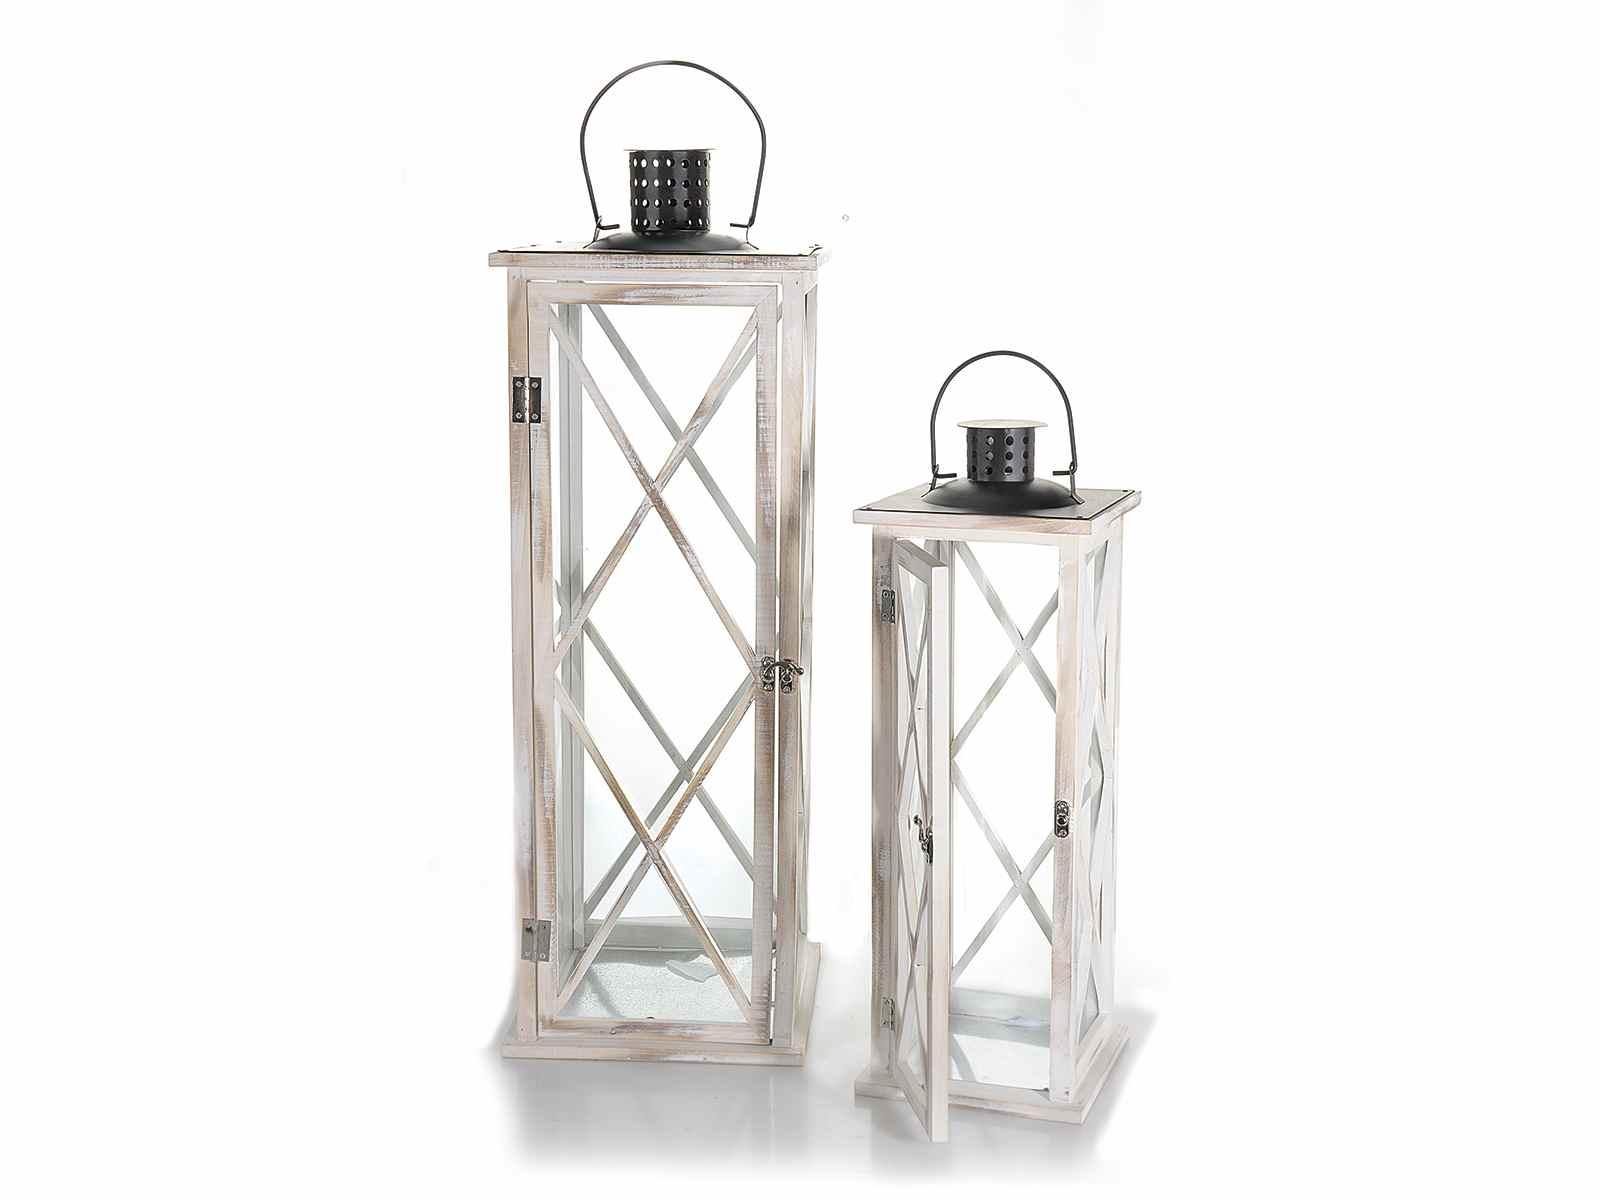 set 2 lanternes en bois blanc avec toit en m tal noir art from italy. Black Bedroom Furniture Sets. Home Design Ideas